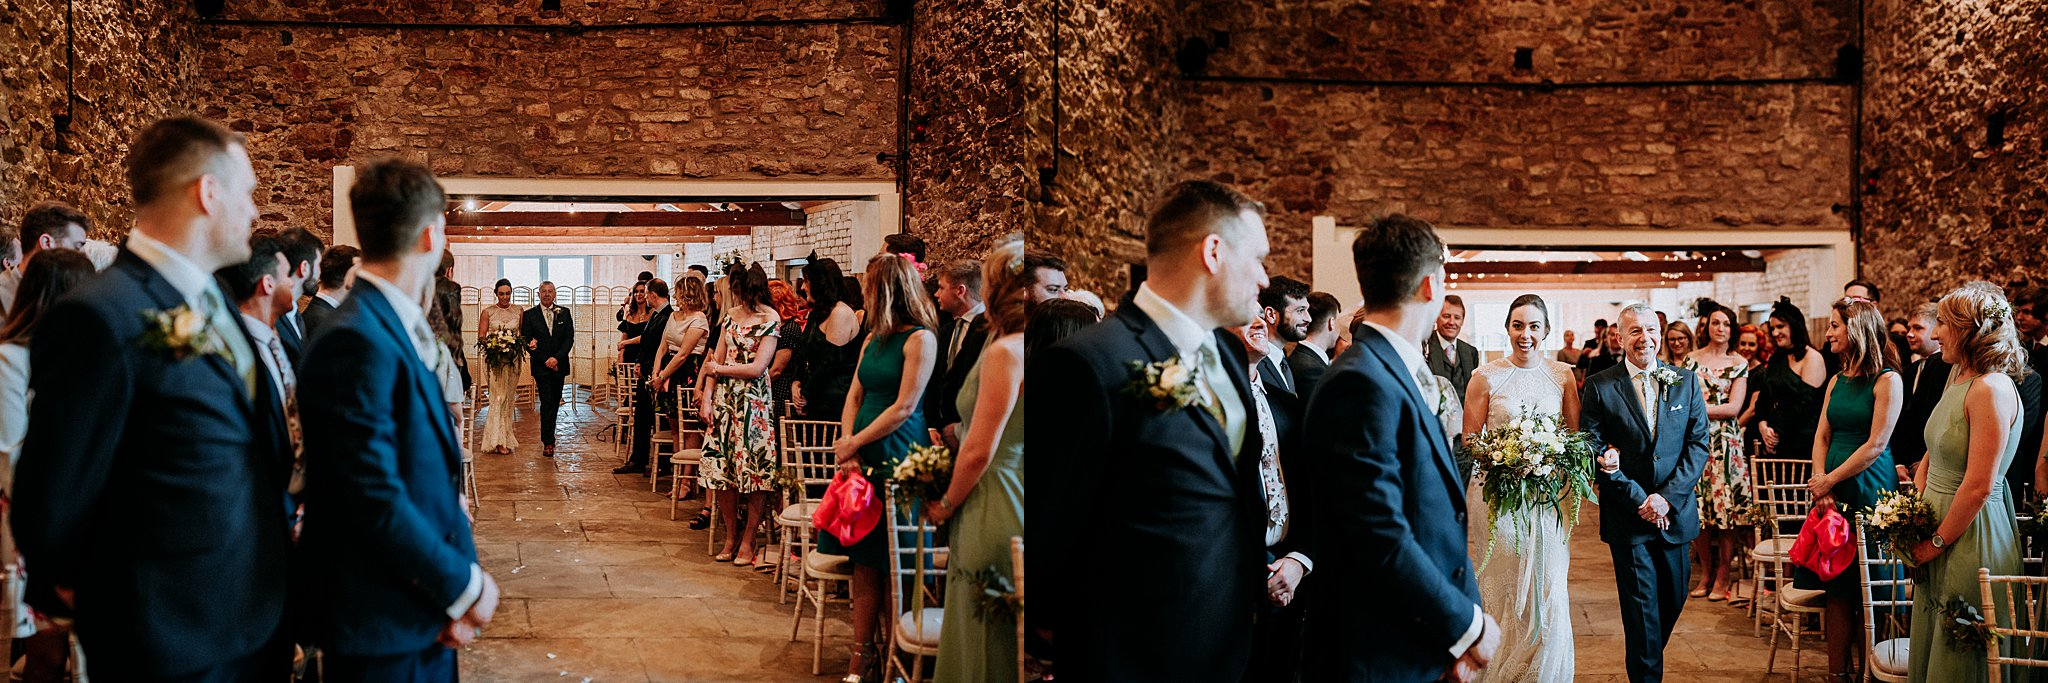 Natural Wedding photographer Cumbria